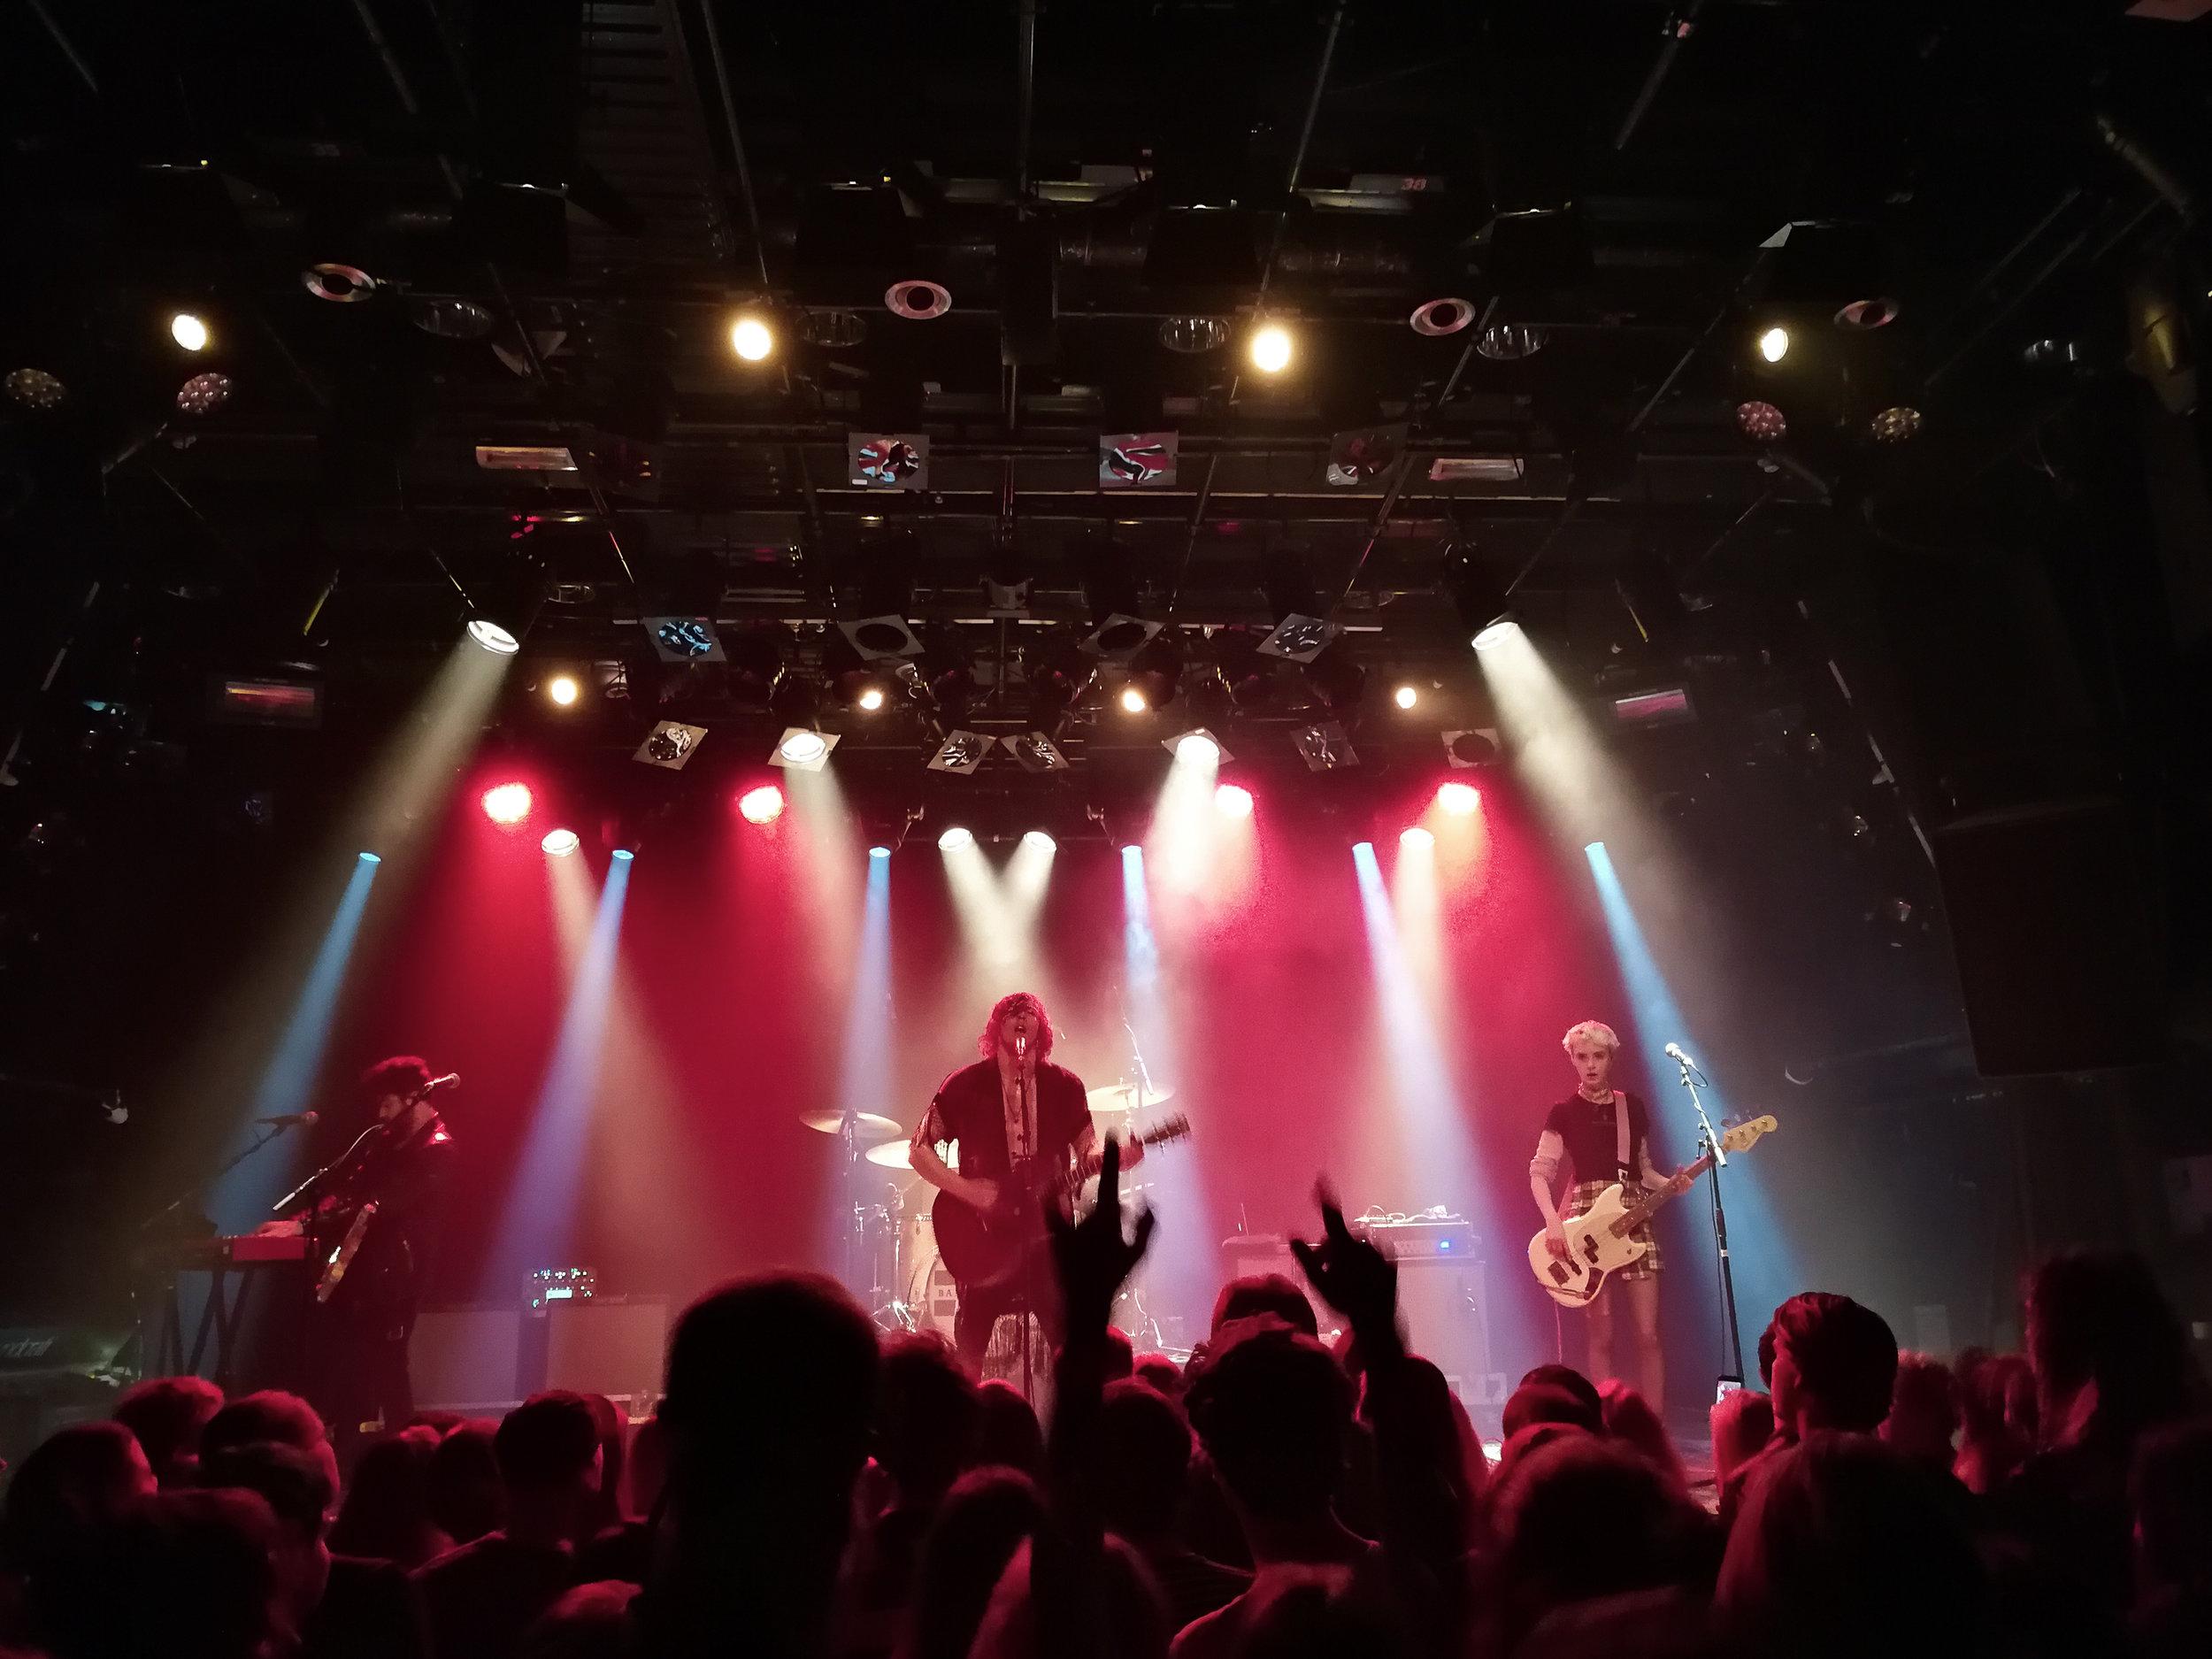 Barns Courtney - Melkweg, AmsterdamMarch 25, 2019